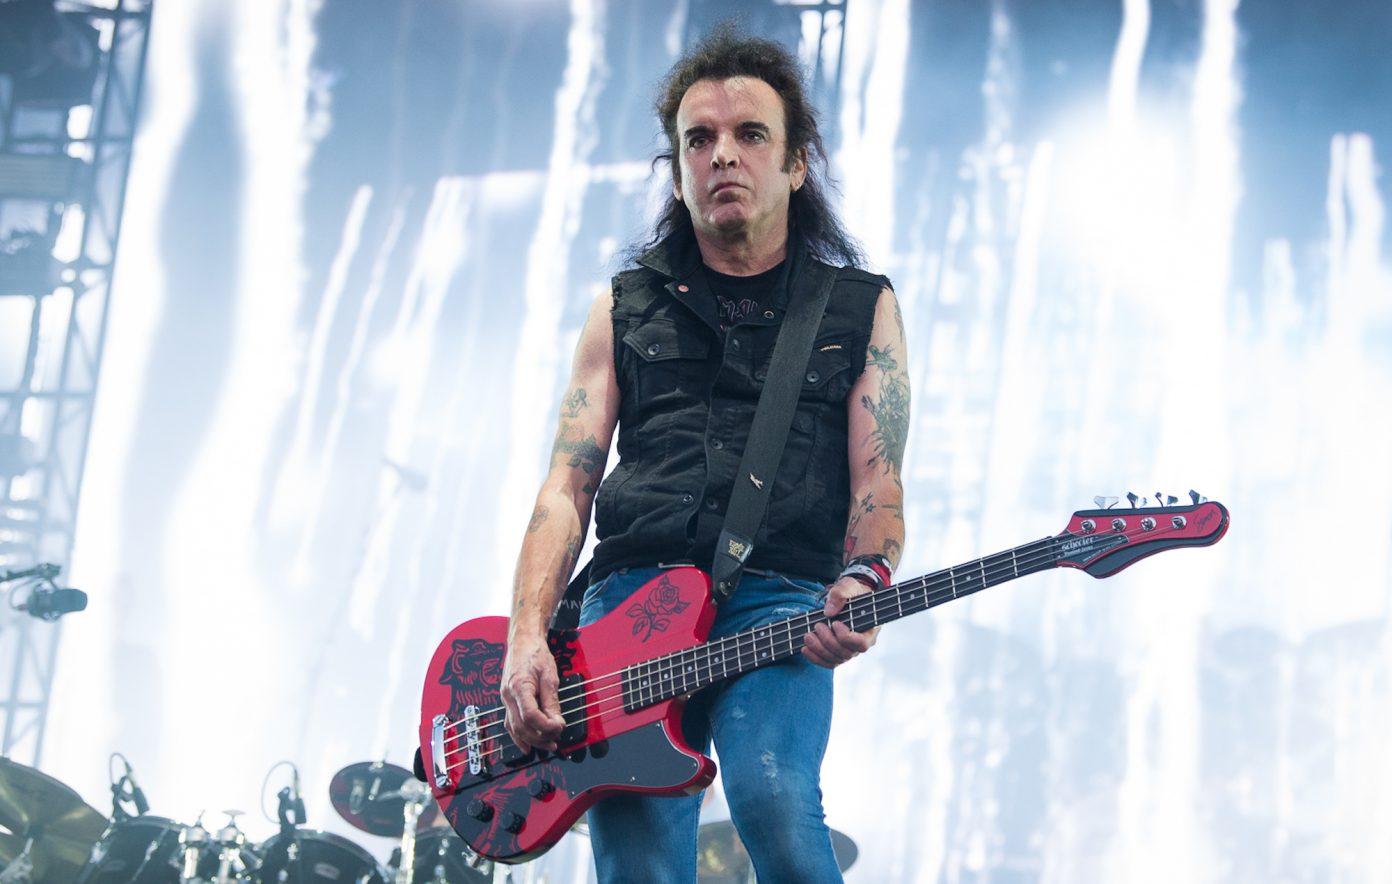 Bassist 'The Cure' Simon Gallup Cabut dari Band, Apa Alasannya?